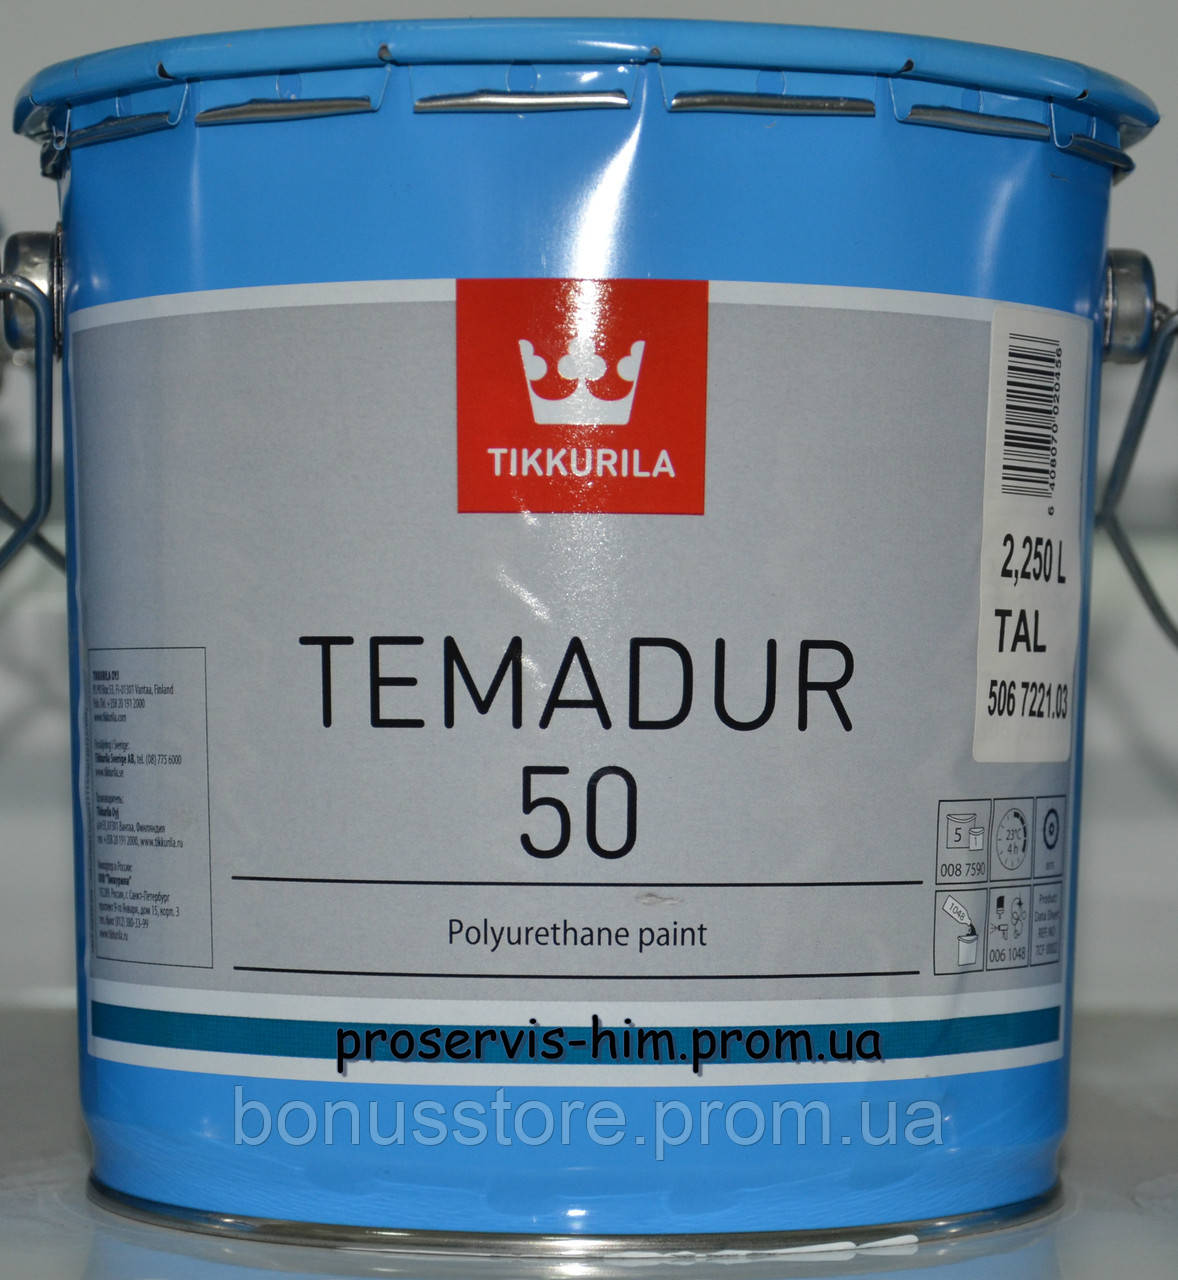 Полиуретановая краска Tikkurila Temadur 90 TСL Темадур  2,25л - ПРОФ-ХИМ express в Виннице